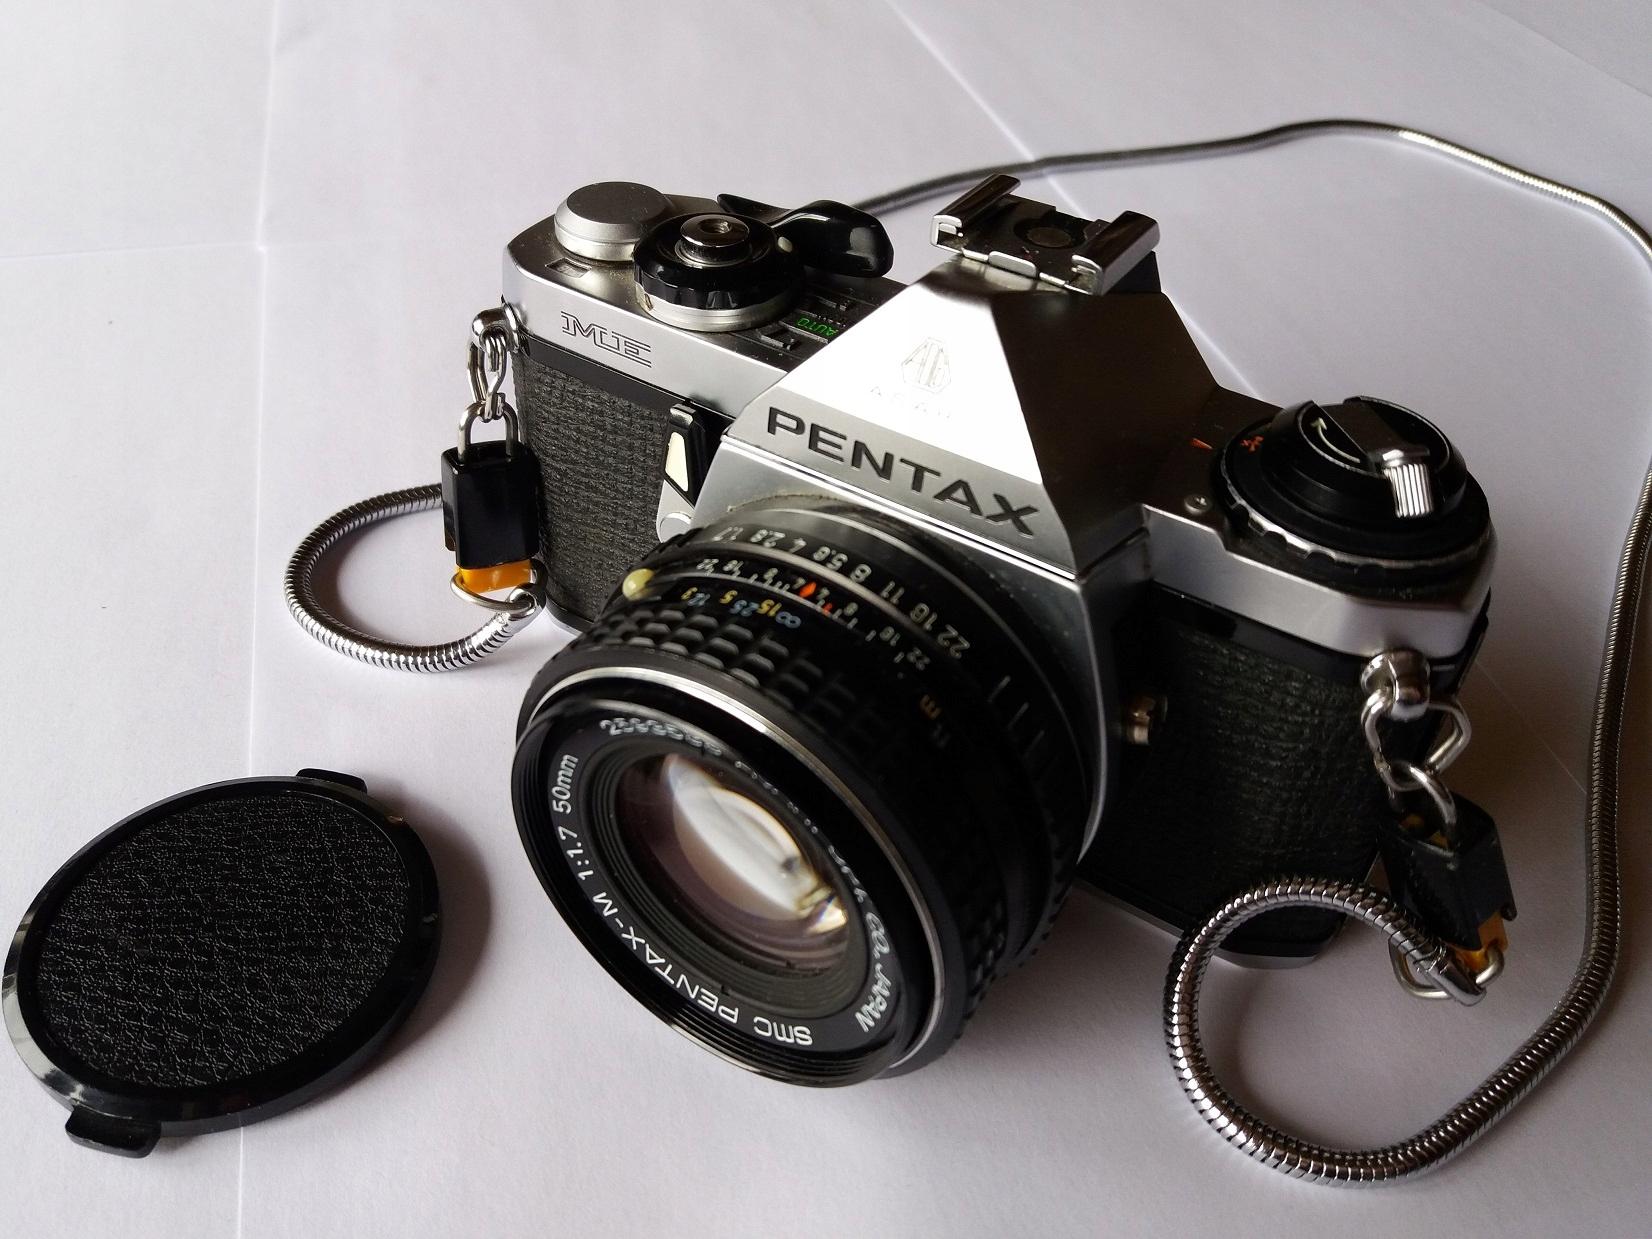 Pentax ME + SMC 1.7 50 mm + 135/3.5 + 400/5.6 BDB